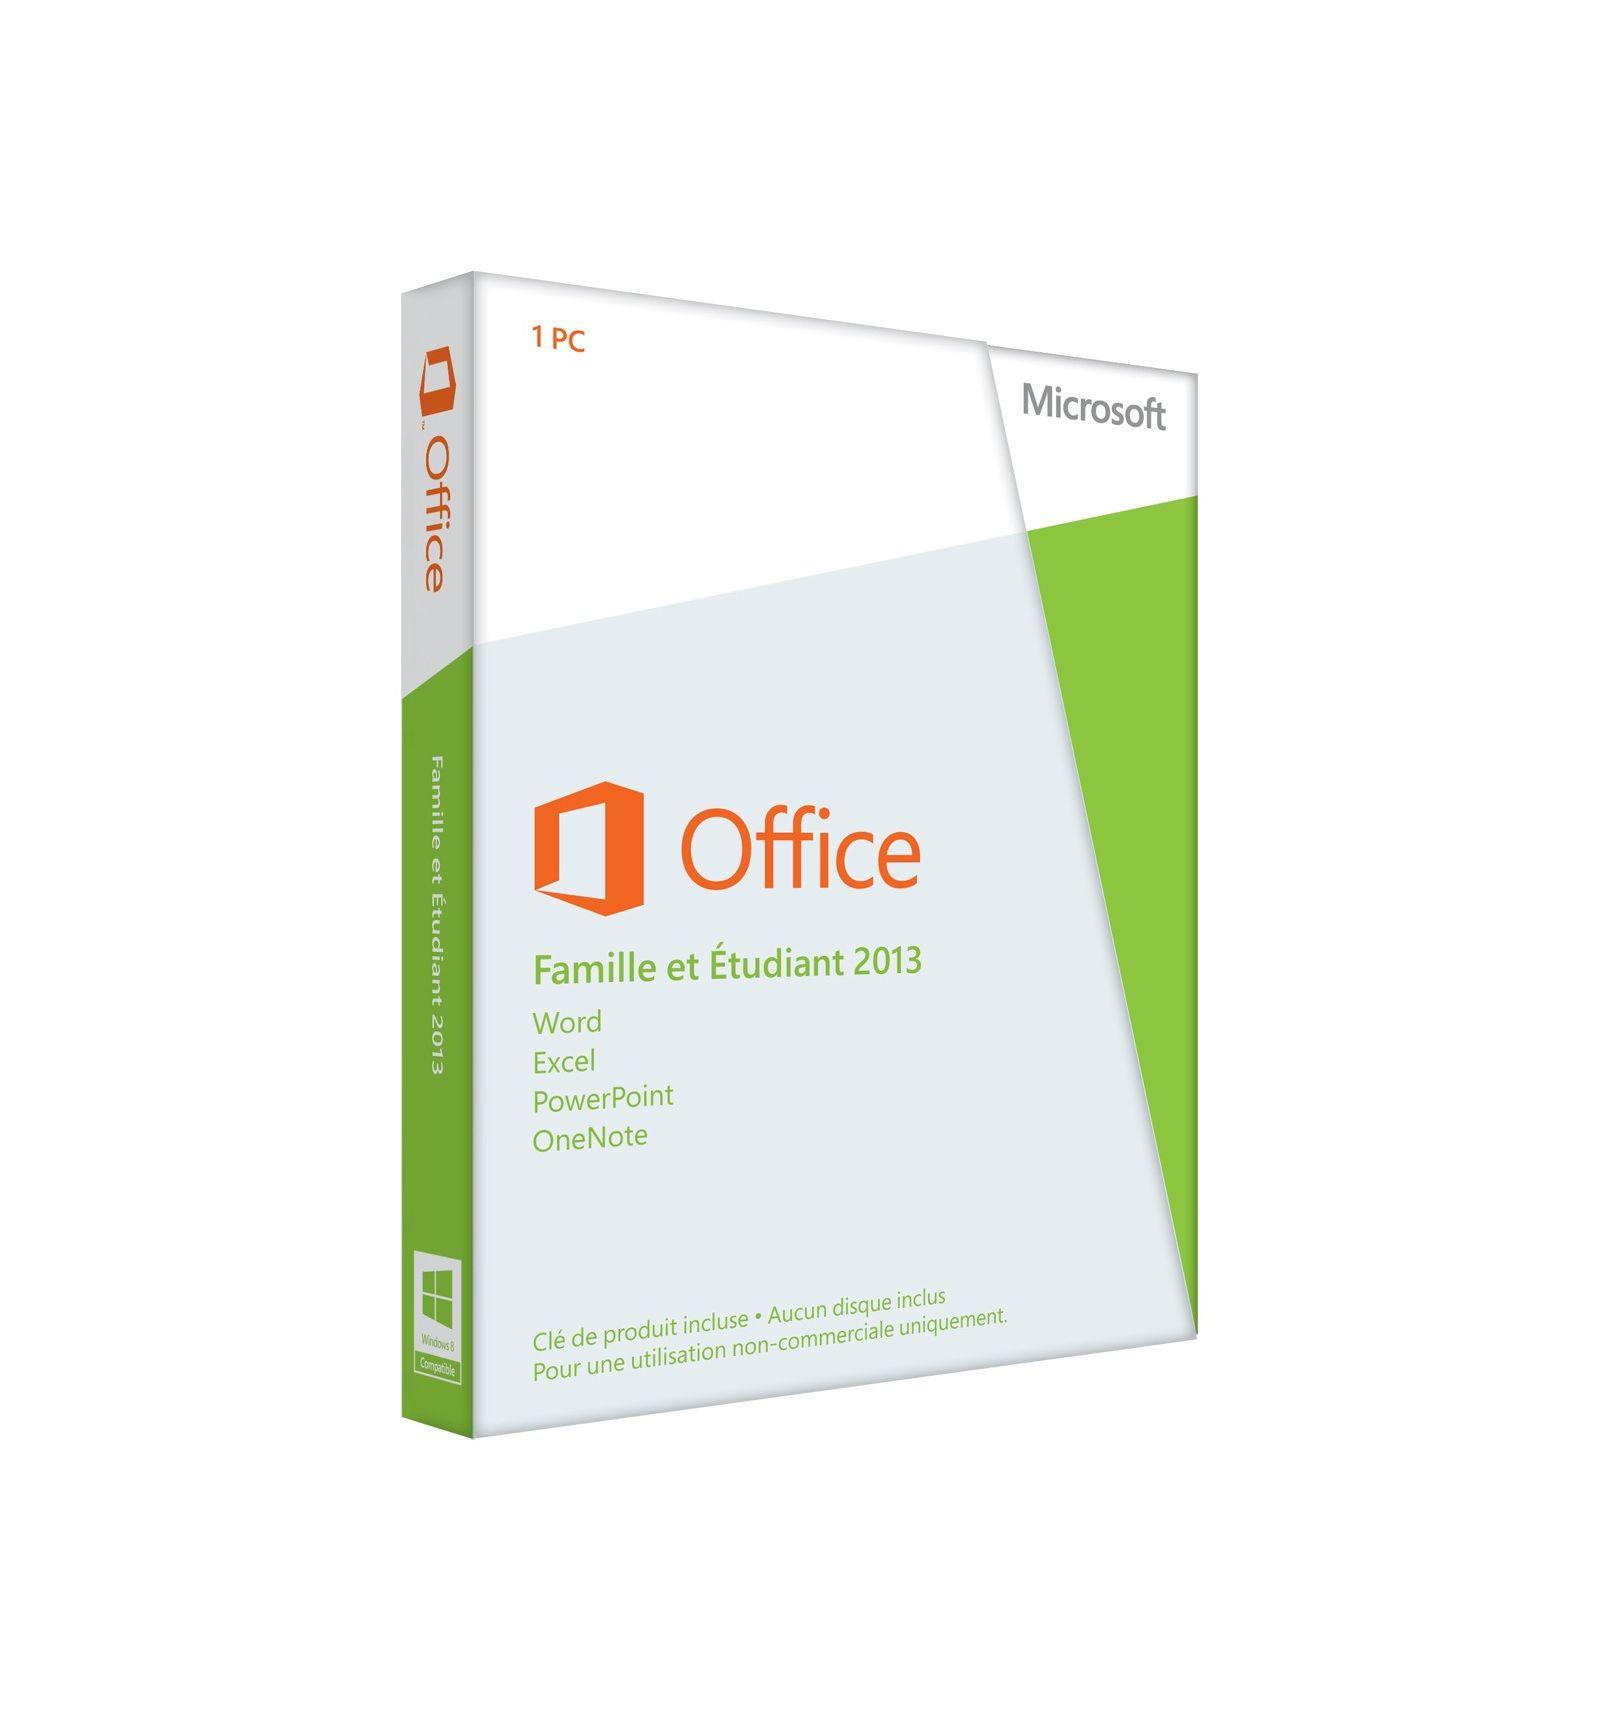 Office 2013 famille etudiant pkc 1 pc 79g 03603 magasin informatique cap 3000 06700 saint - Office famille et etudiant 2013 1 pc ...